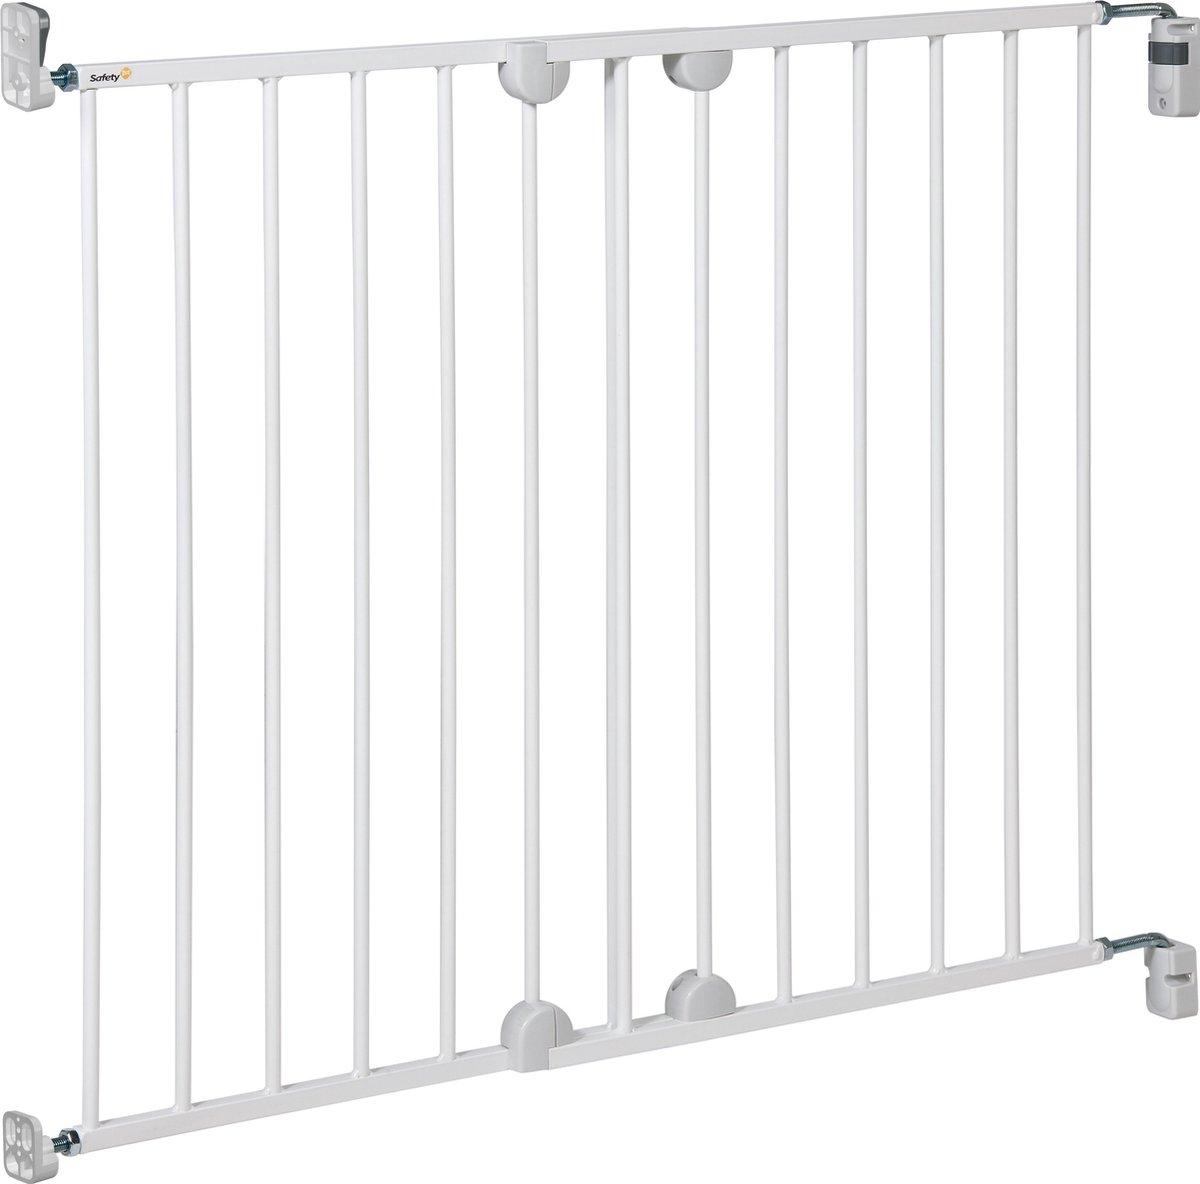 Safety 1st Wall Fix Extending Metal Gate Traphekje - 62-102 cm  - Wit